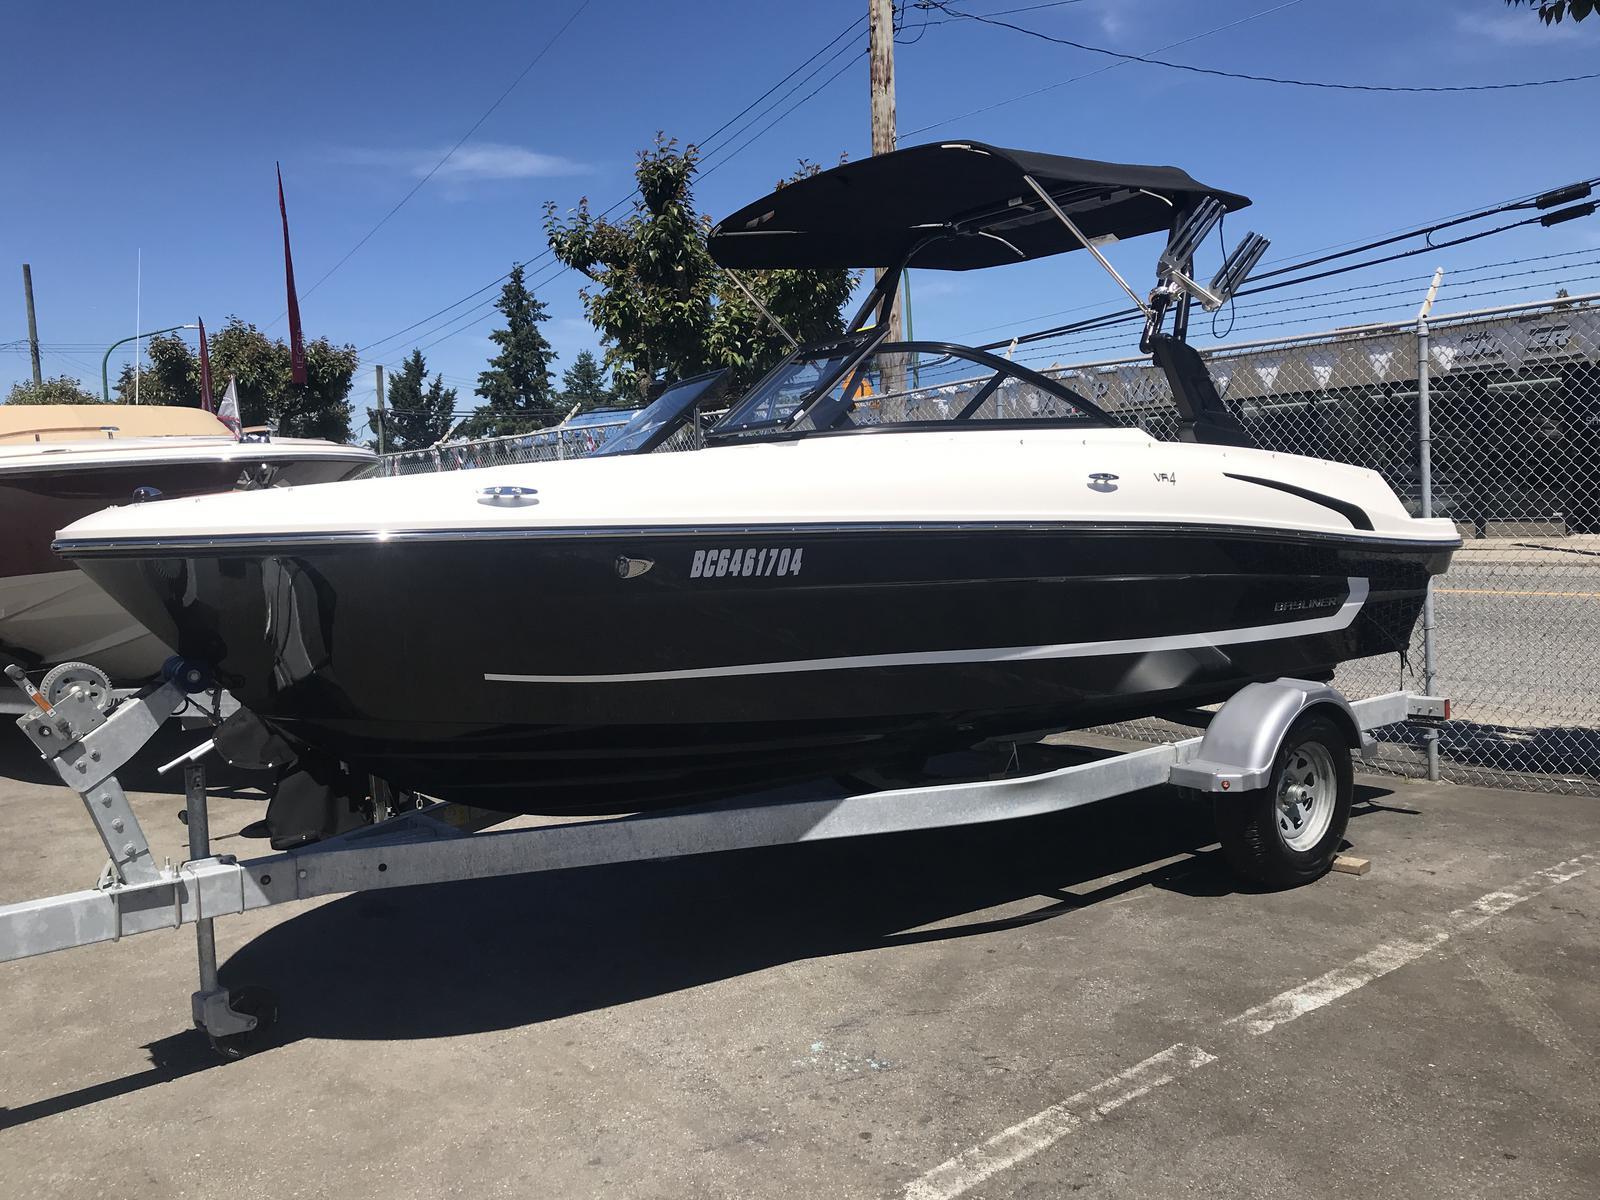 2019 Bayliner boat for sale, model of the boat is VR4 Bowrider & Image # 1 of 23